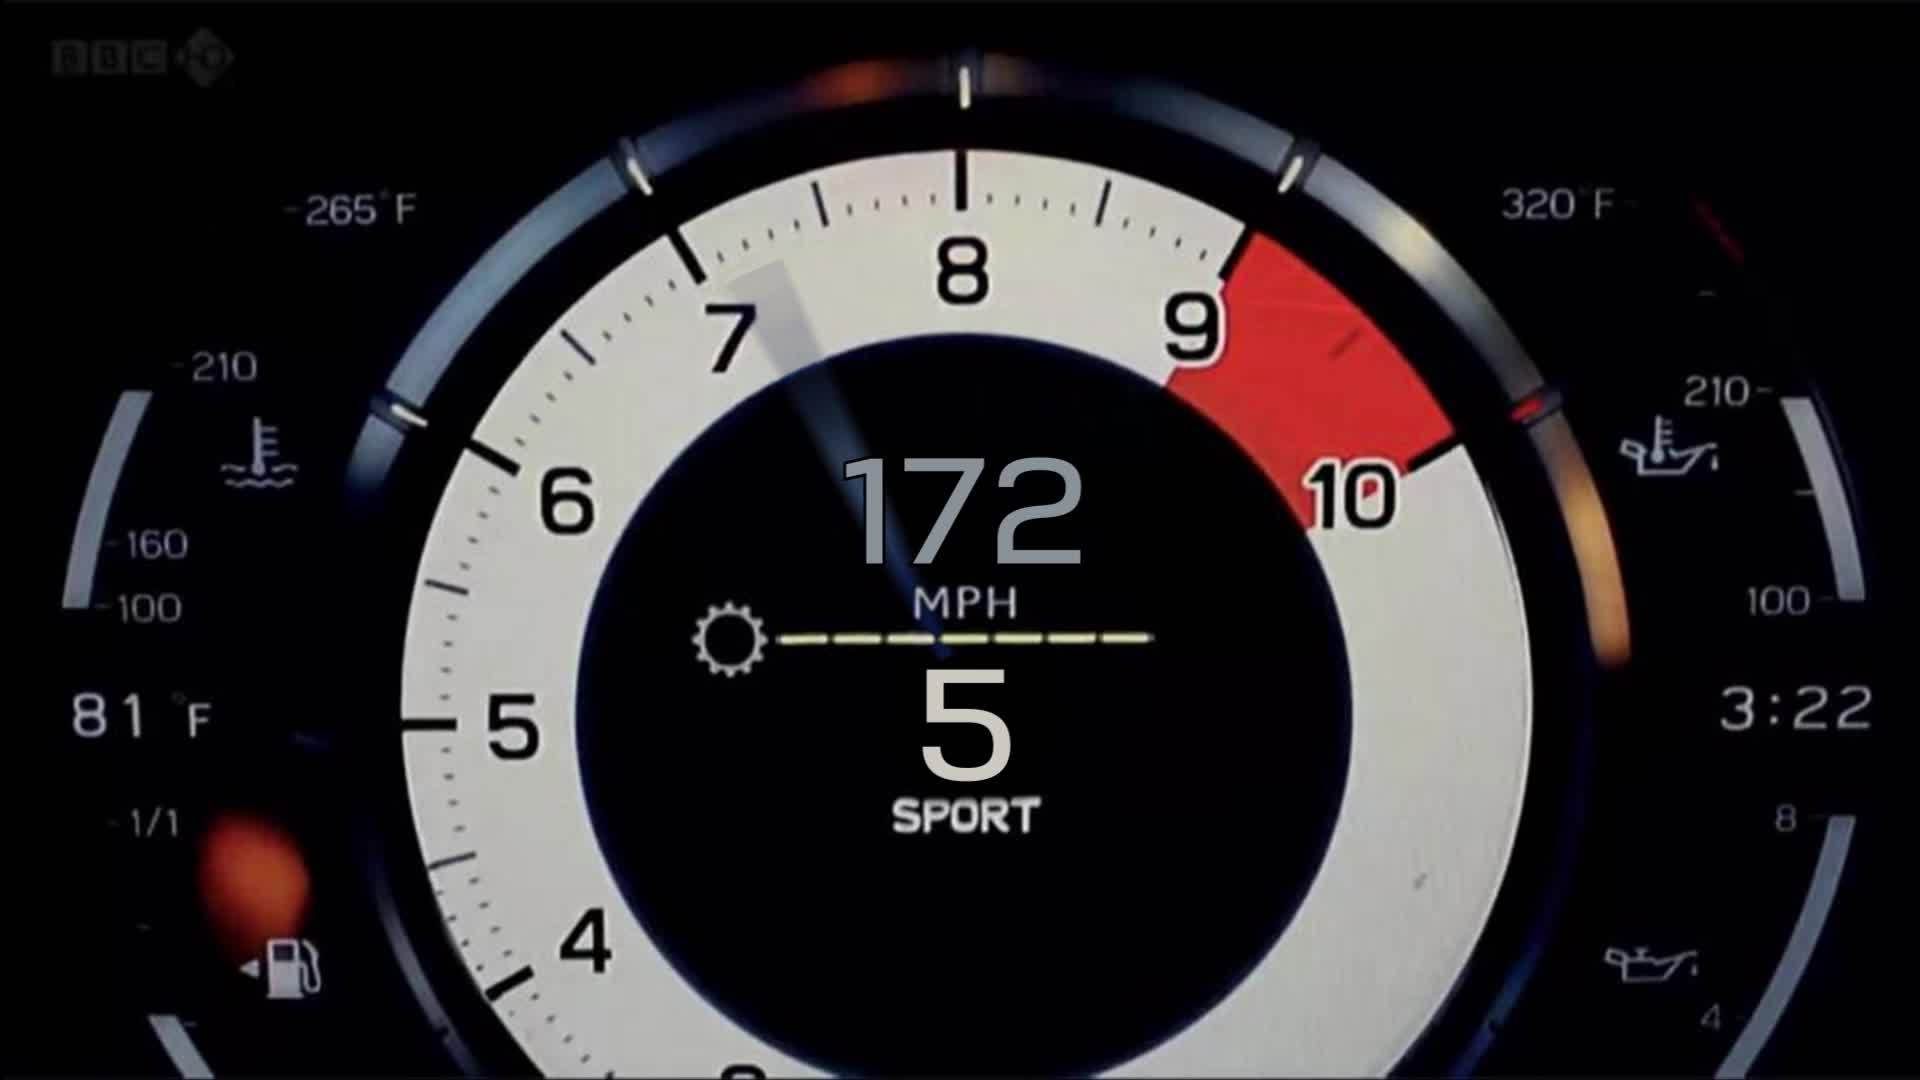 topgear, Top Gear LFA Speed Edit Test GIFs